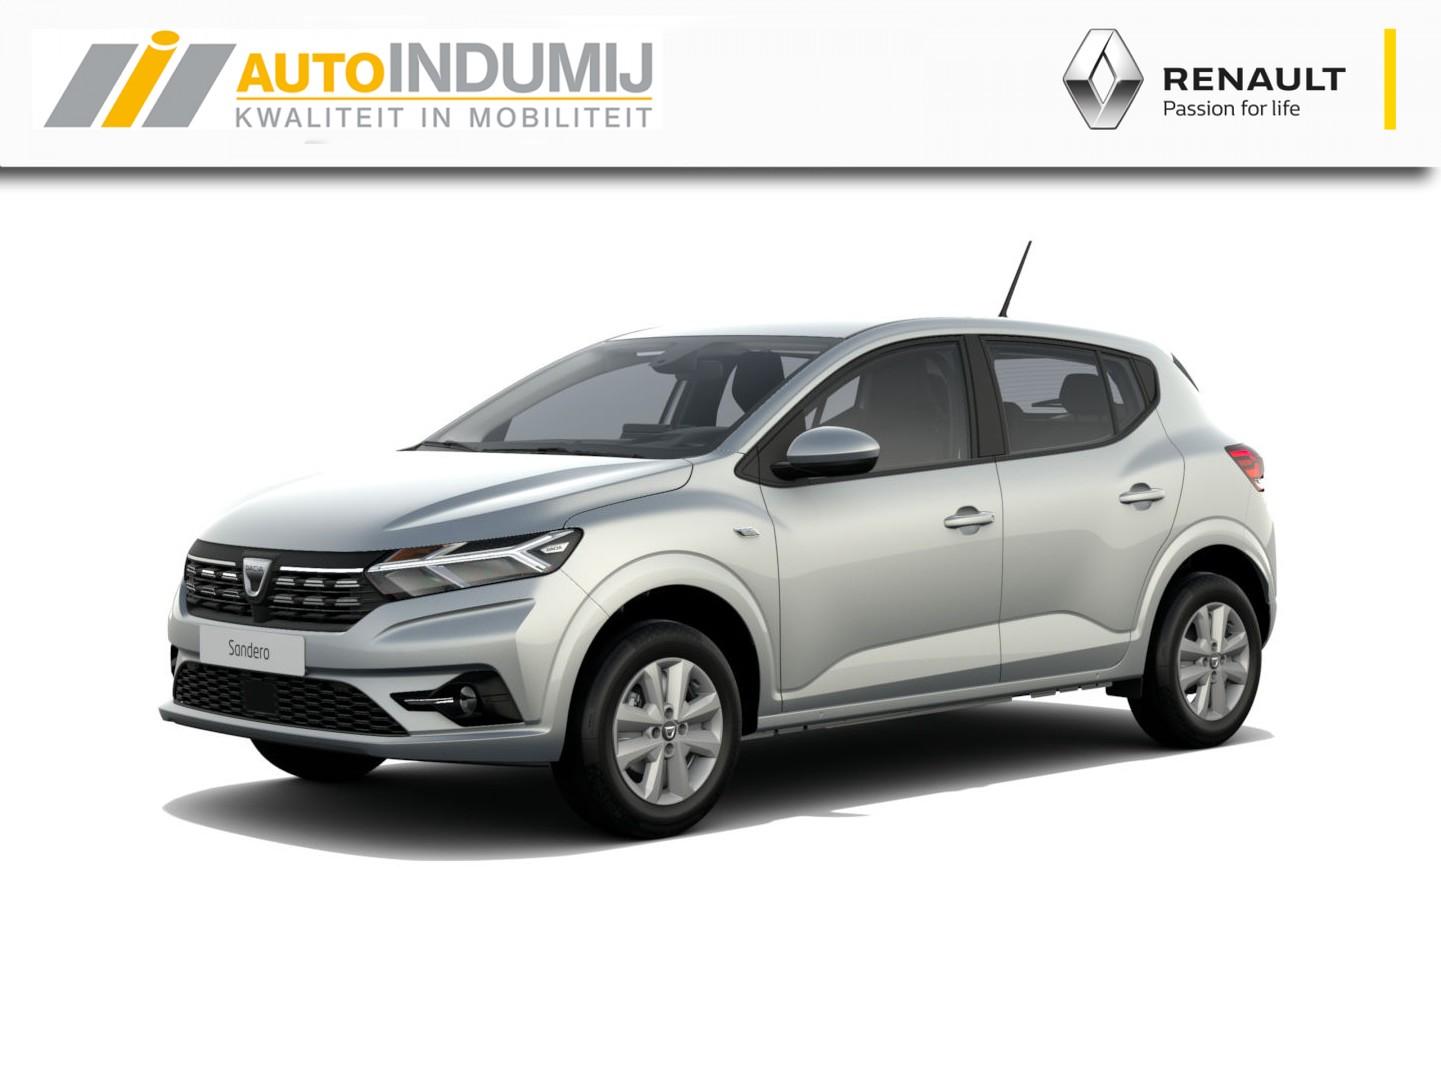 Dacia Sandero Tce 100 comfort bi-fuel